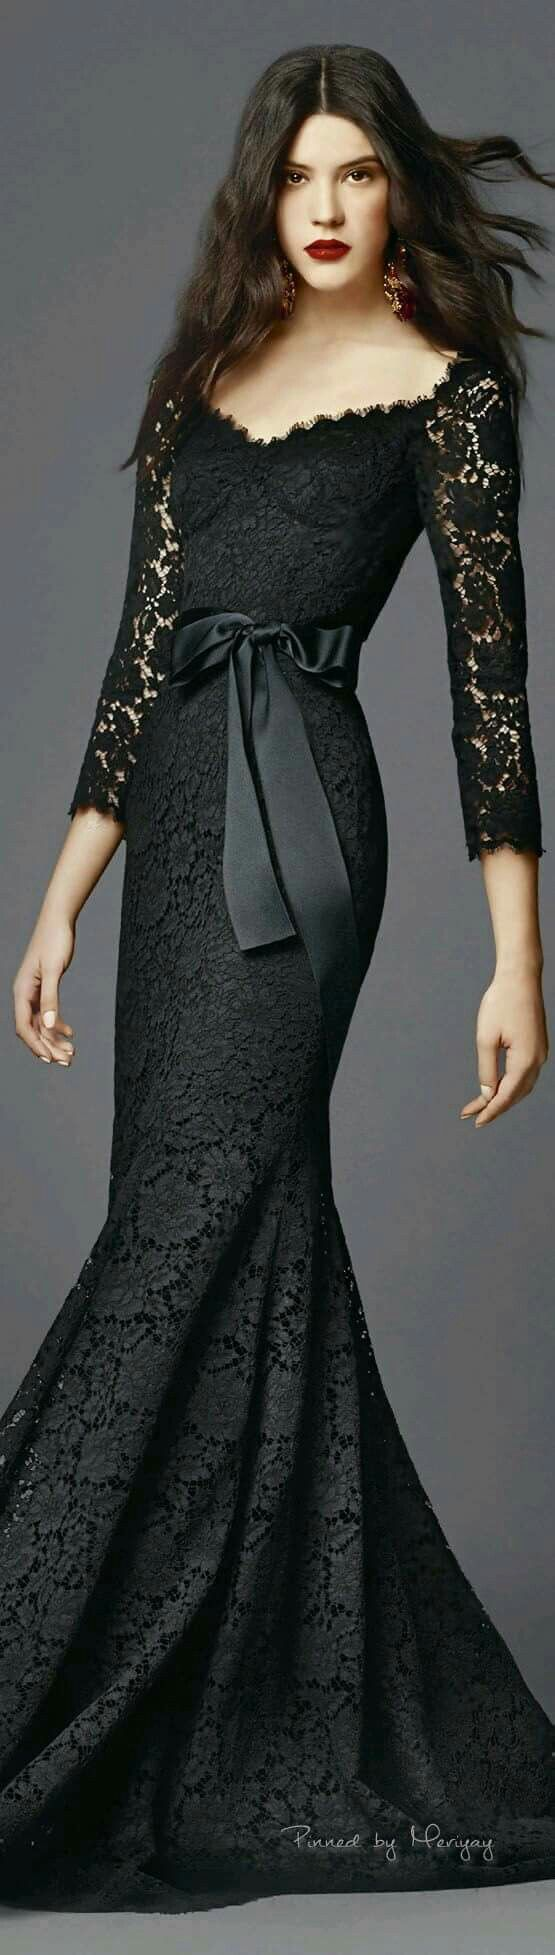 Pin by lily slamat on okeus fashion pinterest vestidos and fashion